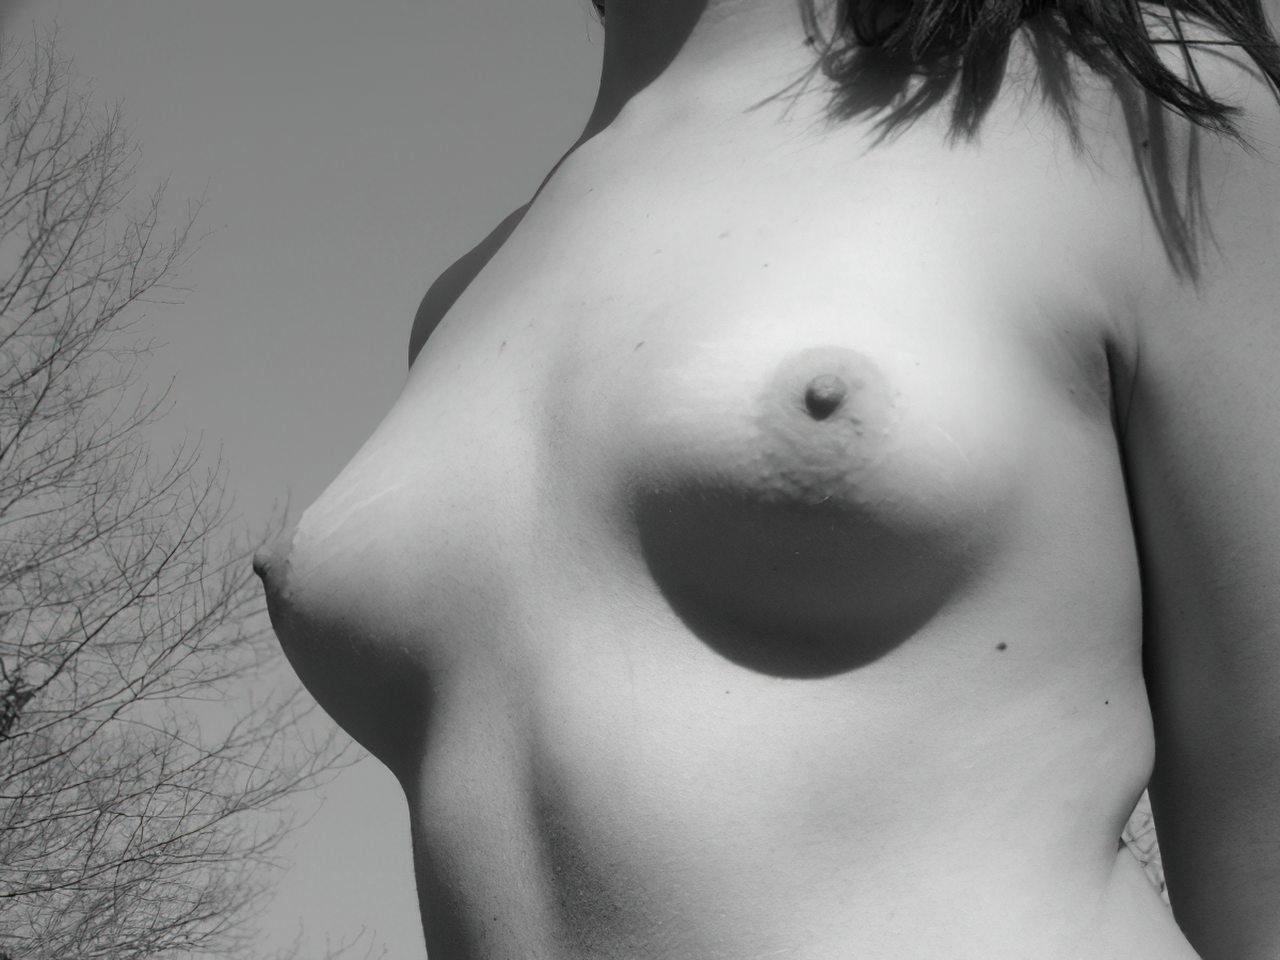 Sensualidade a Preto e Branco (6)